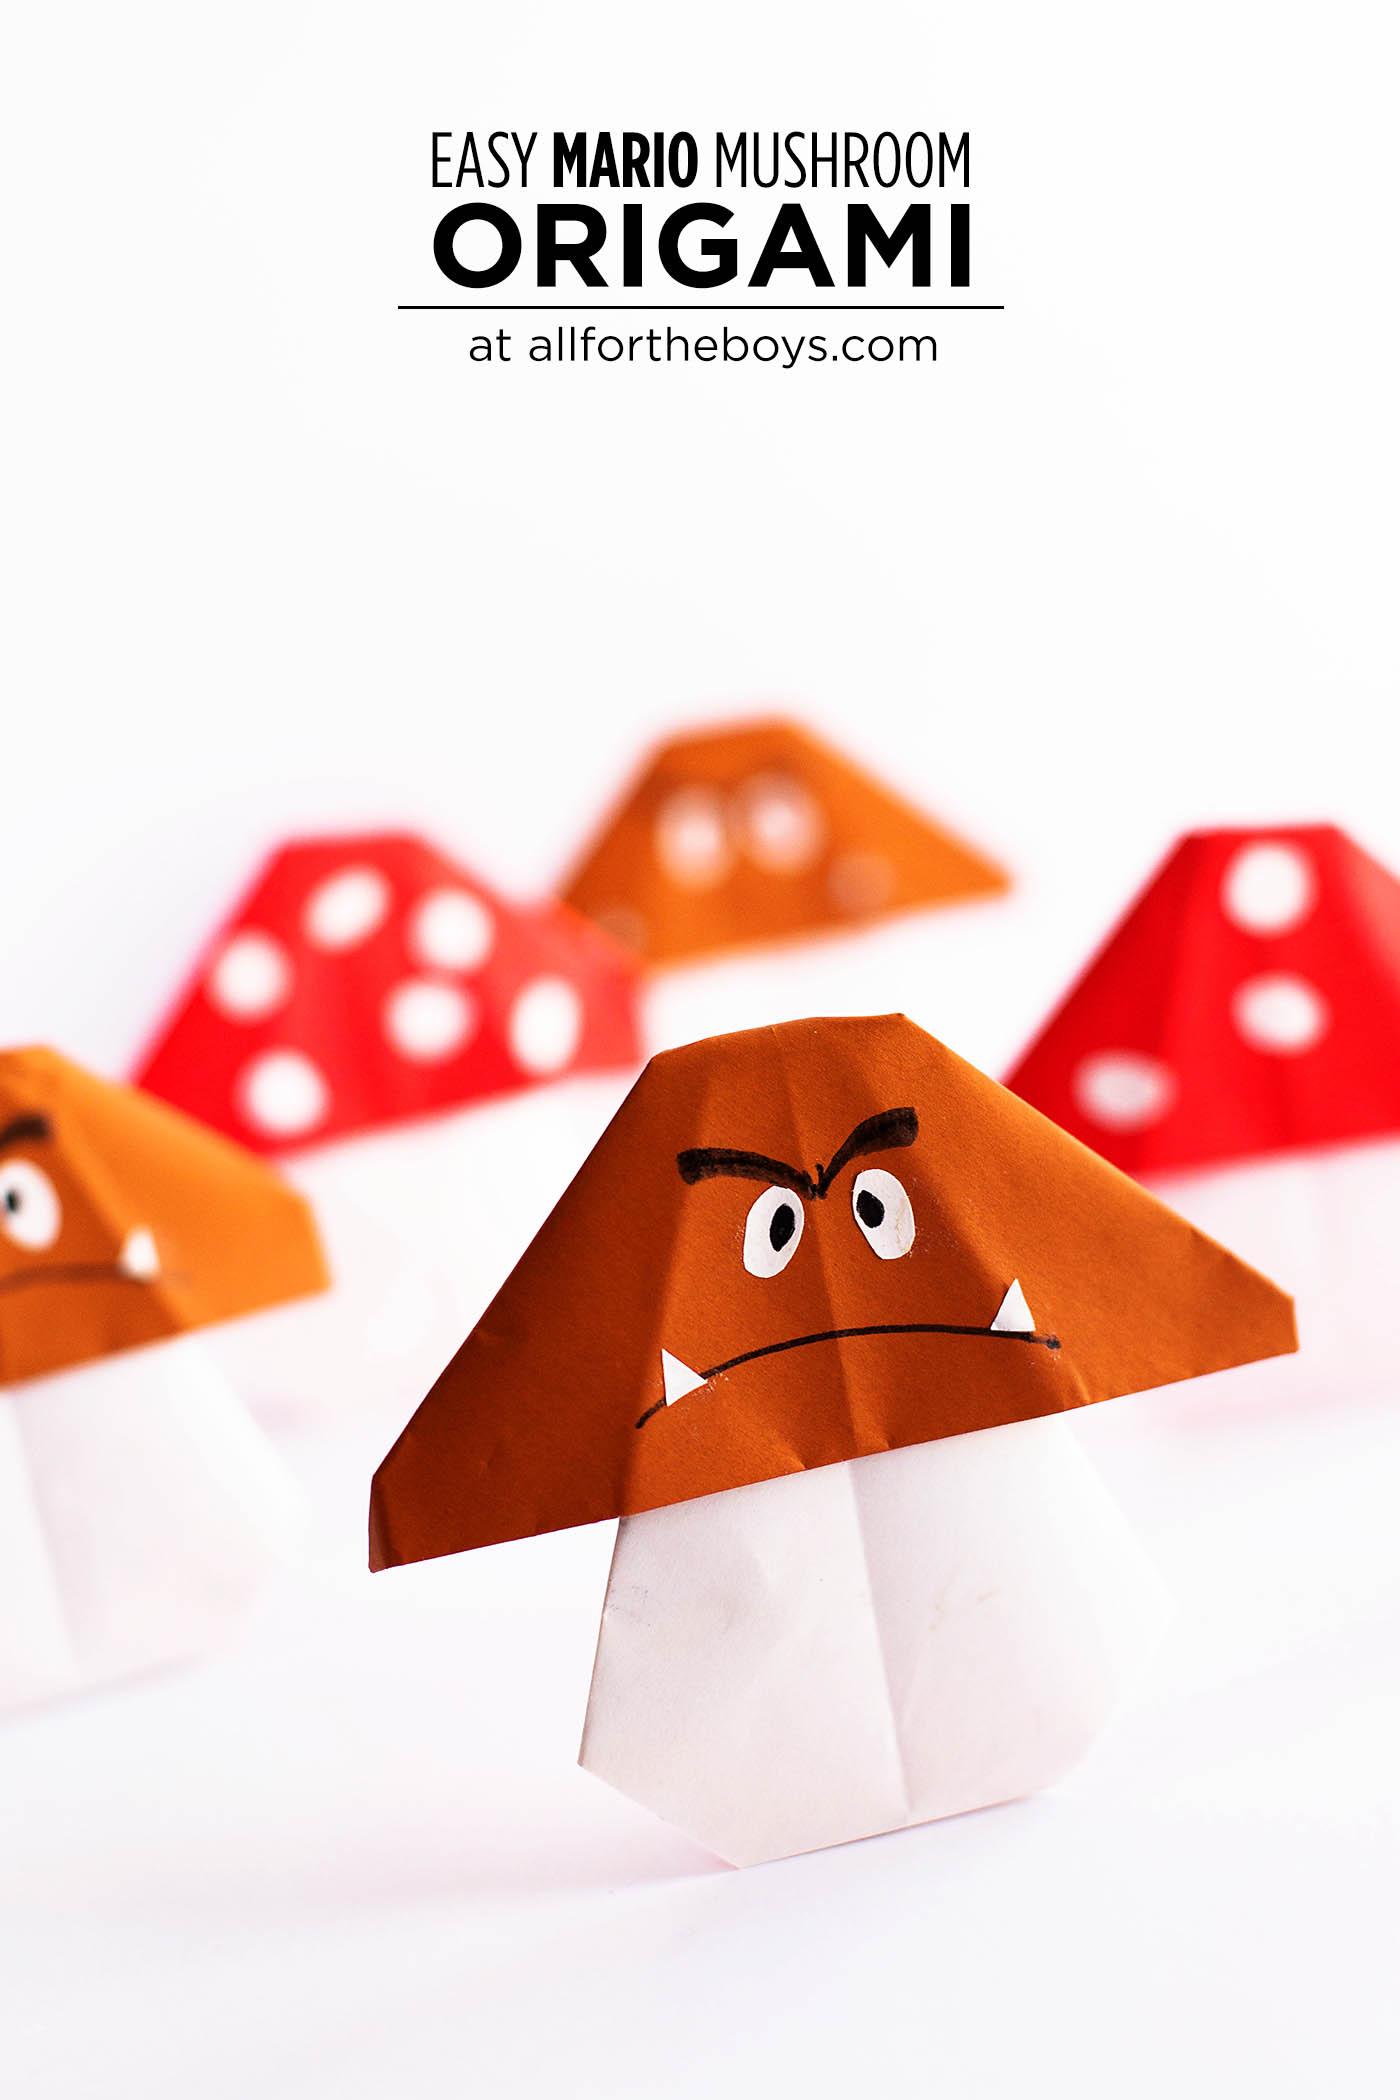 Easy Mario Mushroom Origami — All for the Boys - photo#35